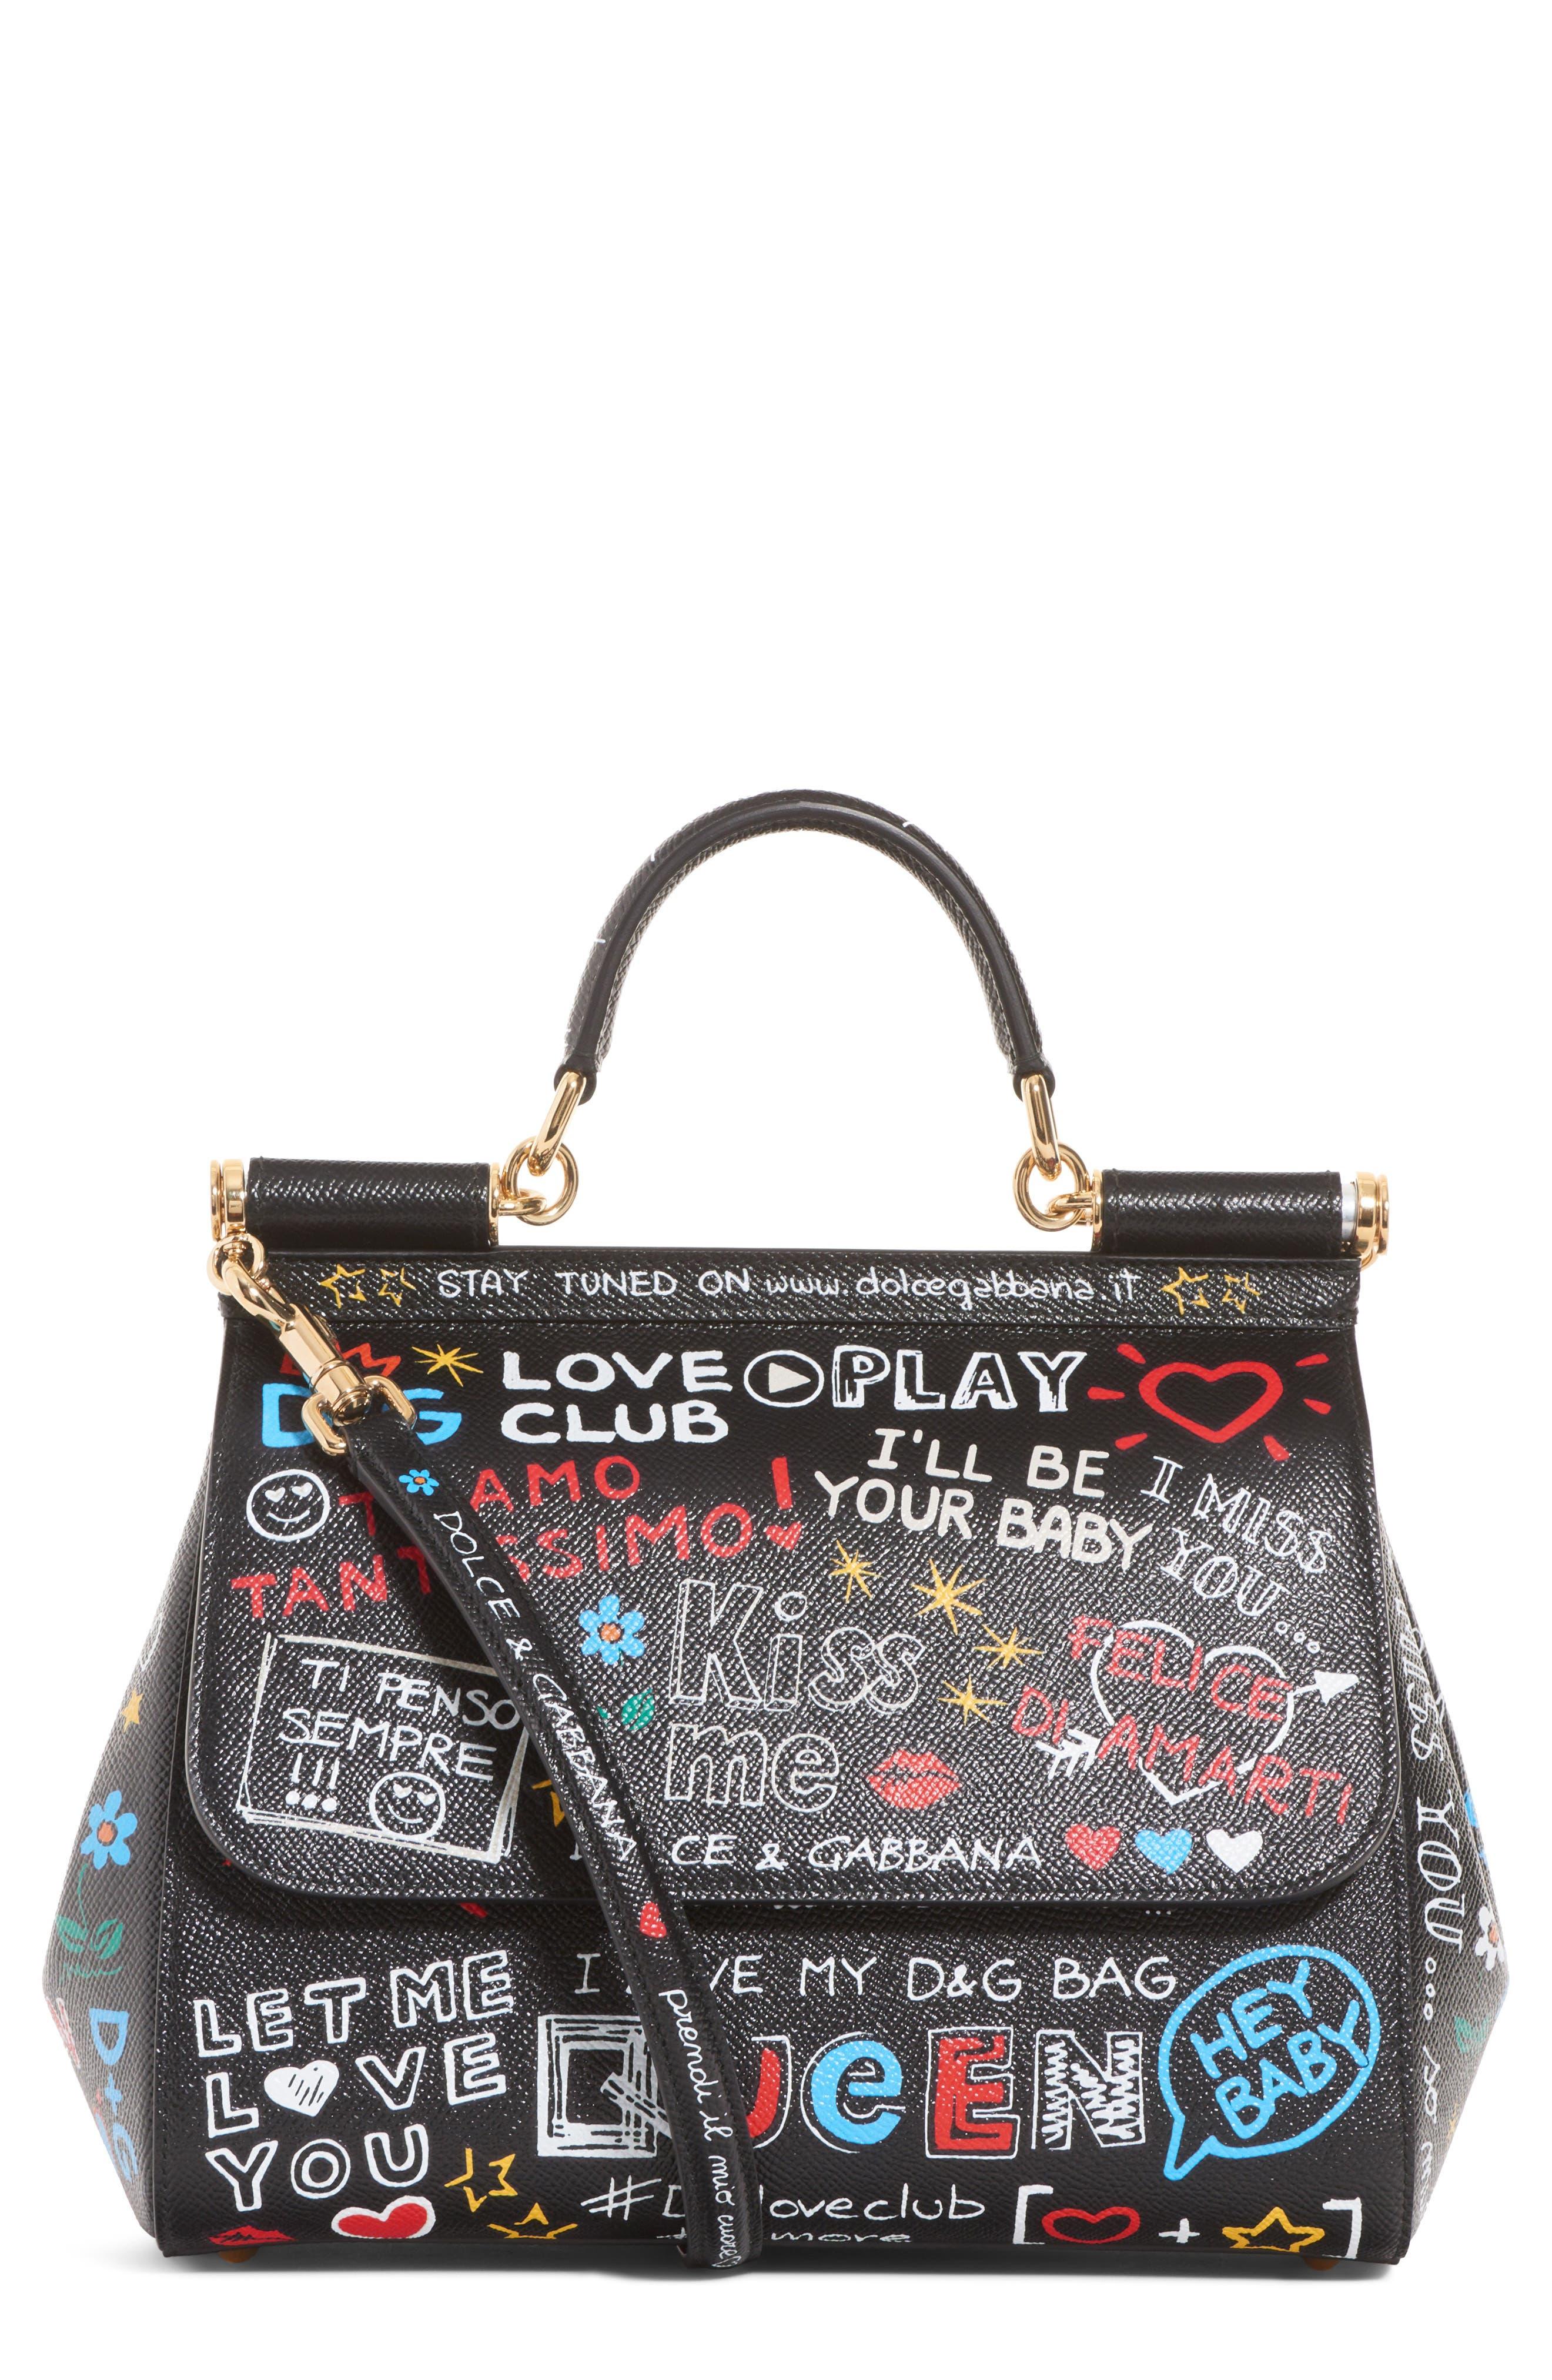 Dolce&Gabbana Medium Sicily Graffiti Print Leather Satchel